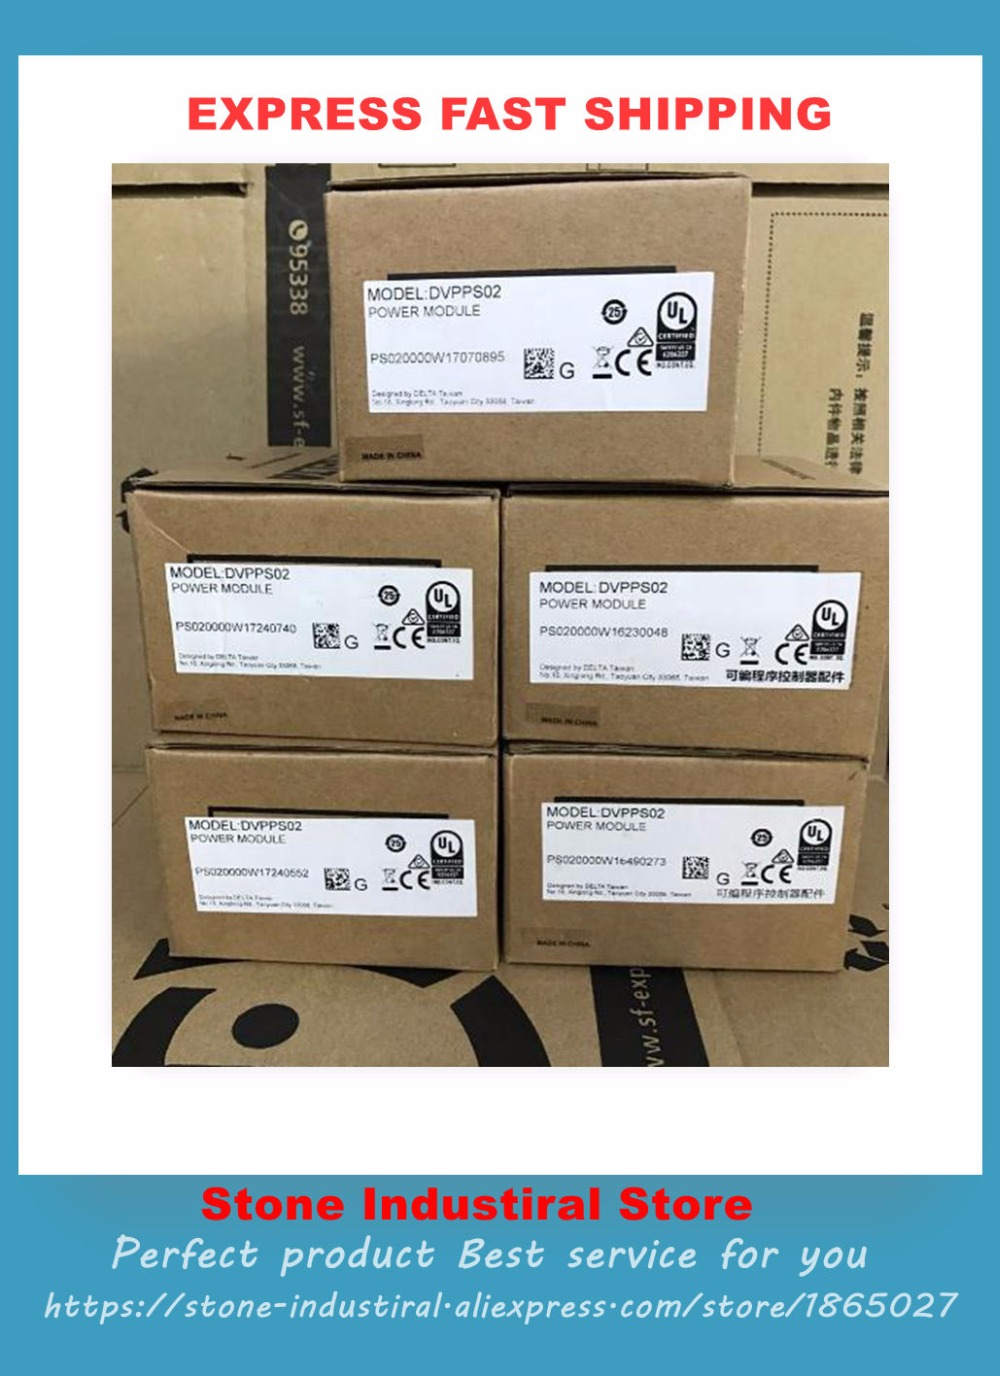 1pcs DVP-PS02 DVPPS02 New original PLC1pcs DVP-PS02 DVPPS02 New original PLC